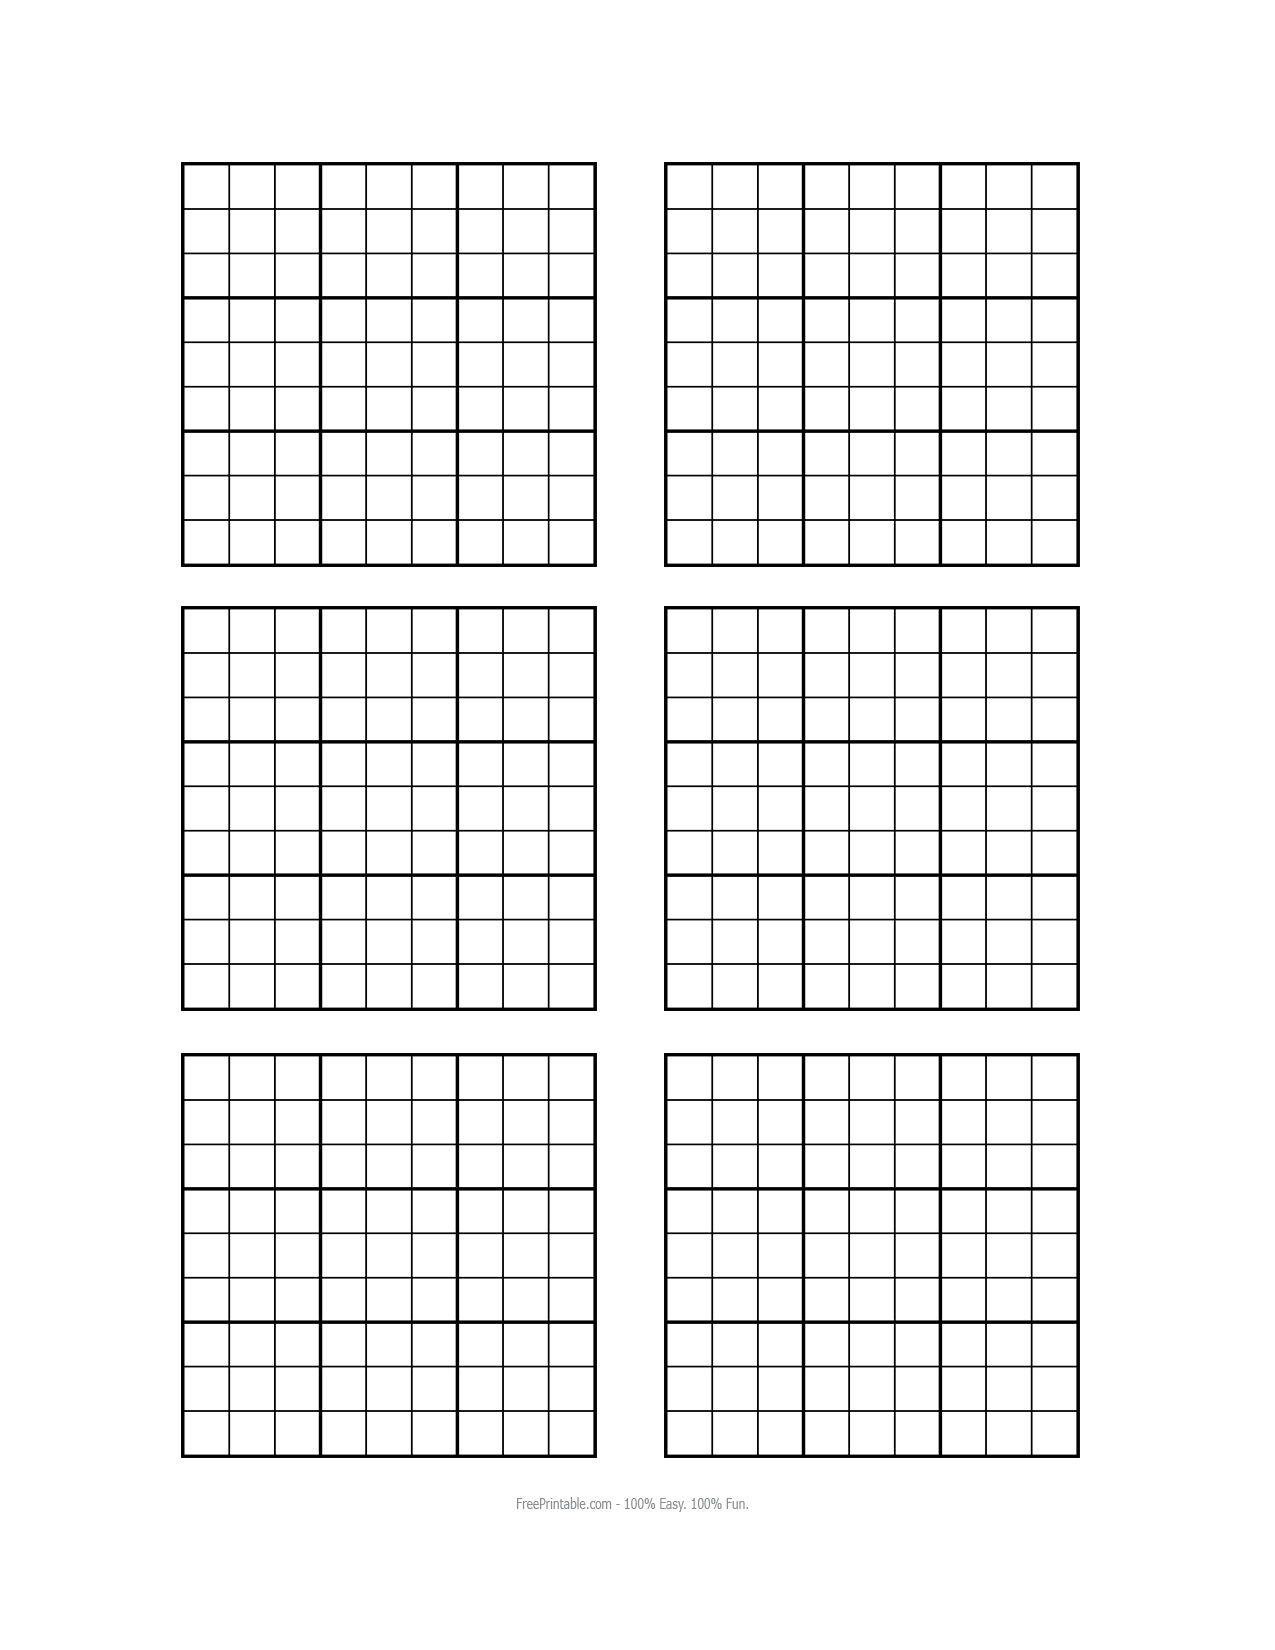 Blank Sudoku Grid - Falep.midnightpig.co